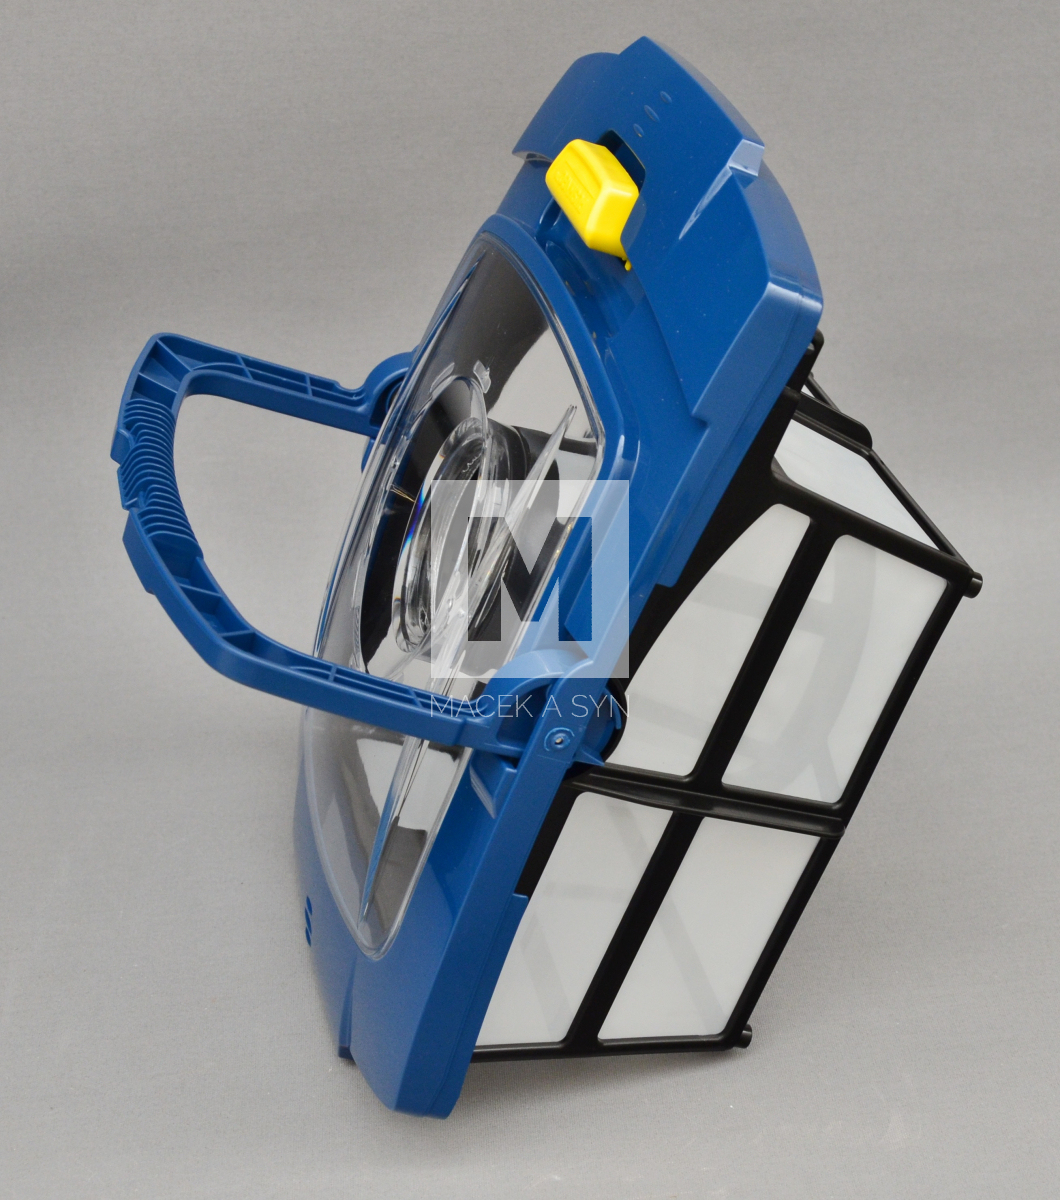 Robot Rc4400 Cyclonx pour Robot Piscine Zodiac Rc 4400